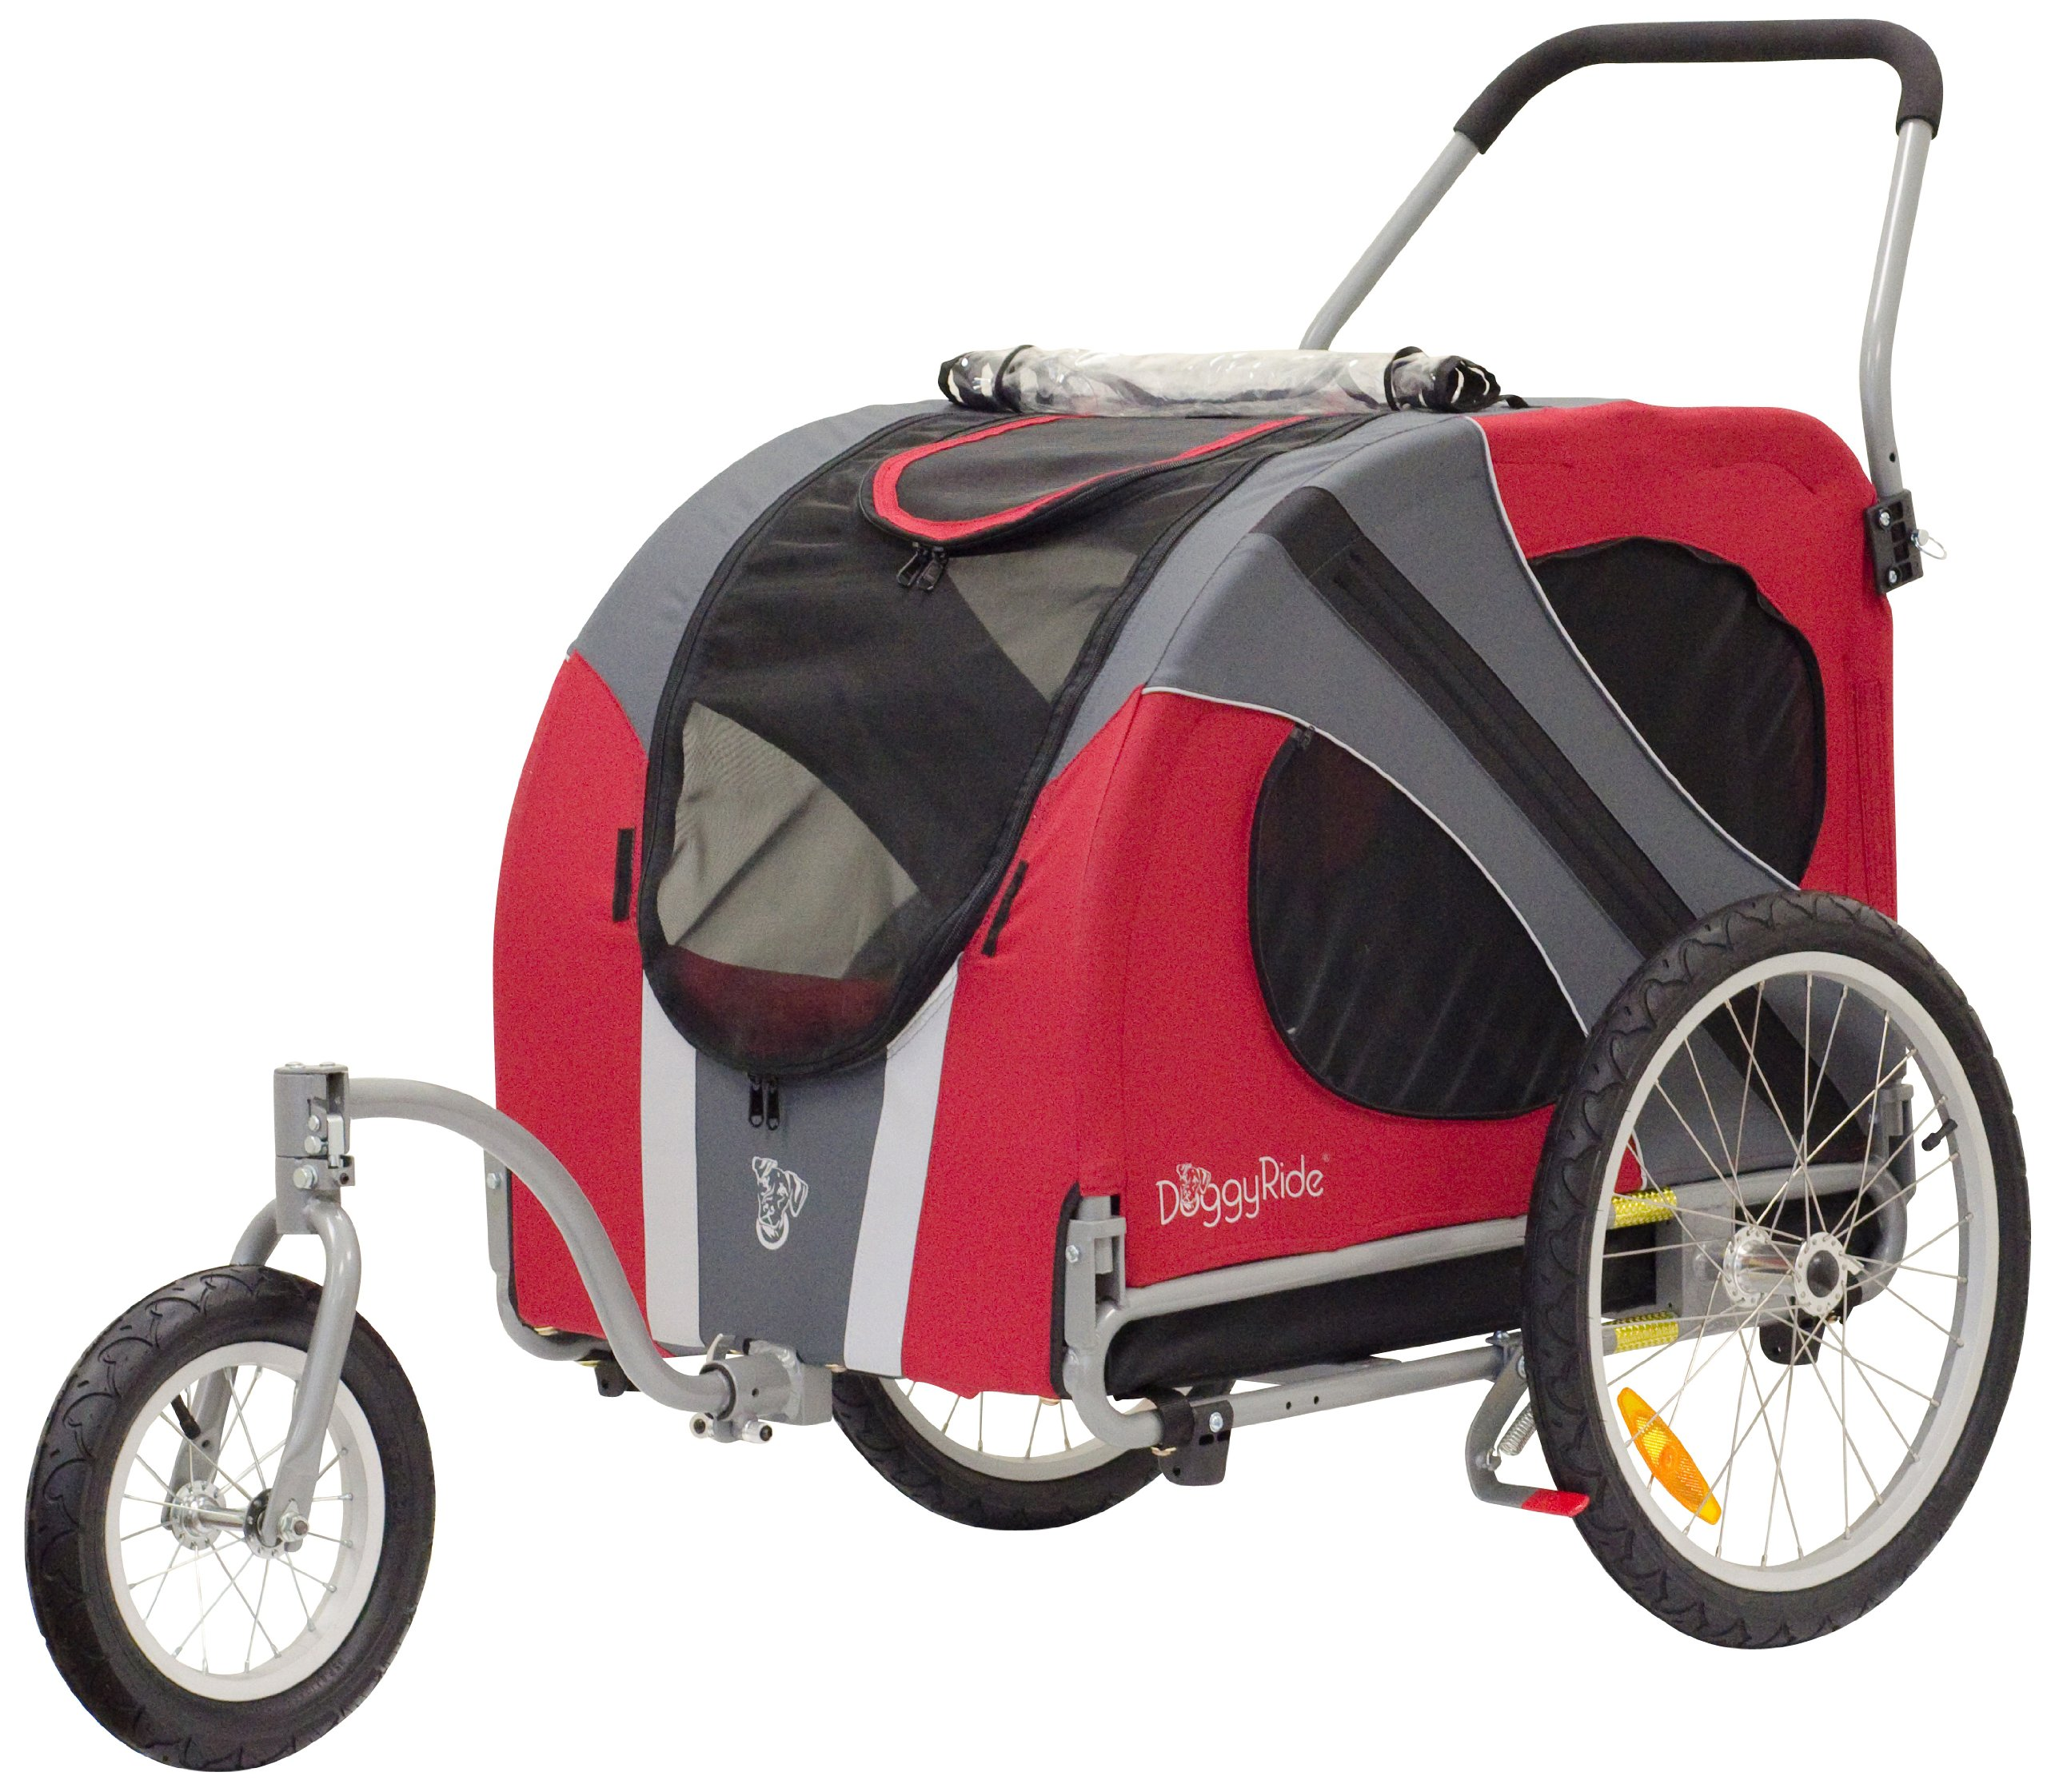 DoggyRide Novel Dog Jogger-Stroller, Urban Red